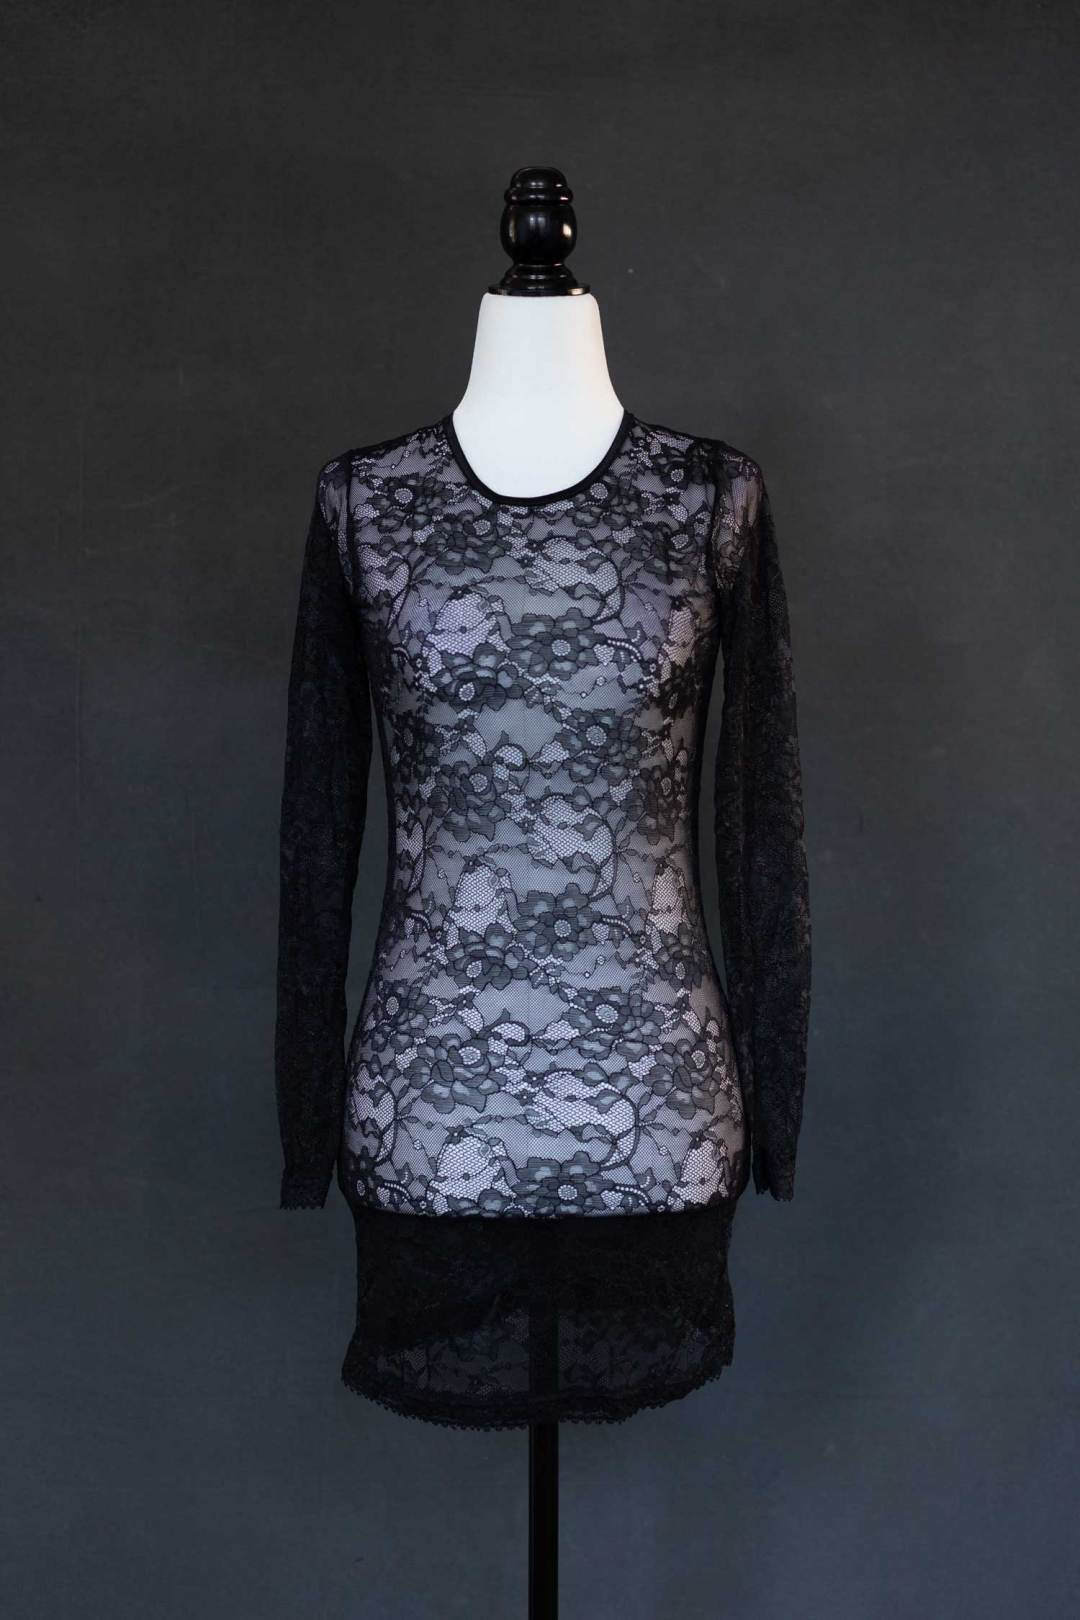 Black lace see through shirt